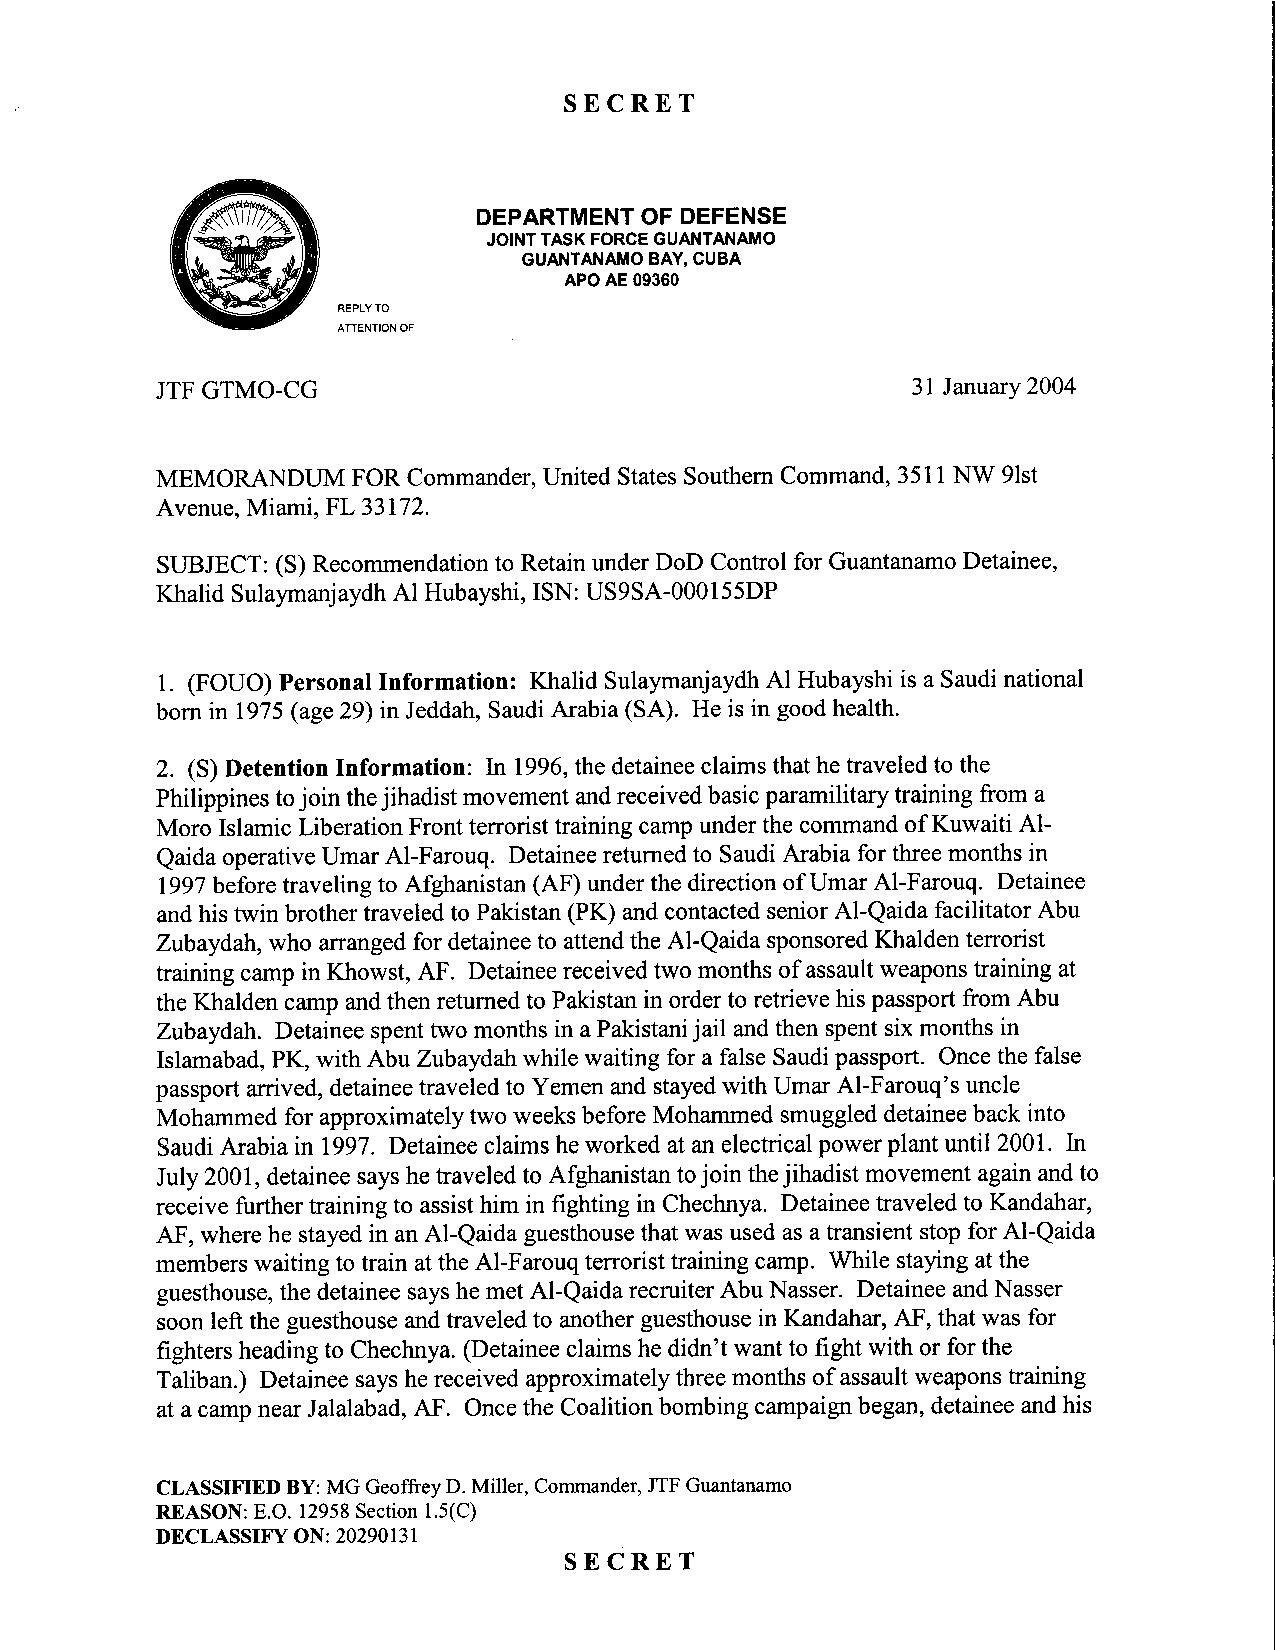 ISN 00155, Khalid Sulaymanjaydh Al Hubayshi's Guantanamo detainee assessment.pdf